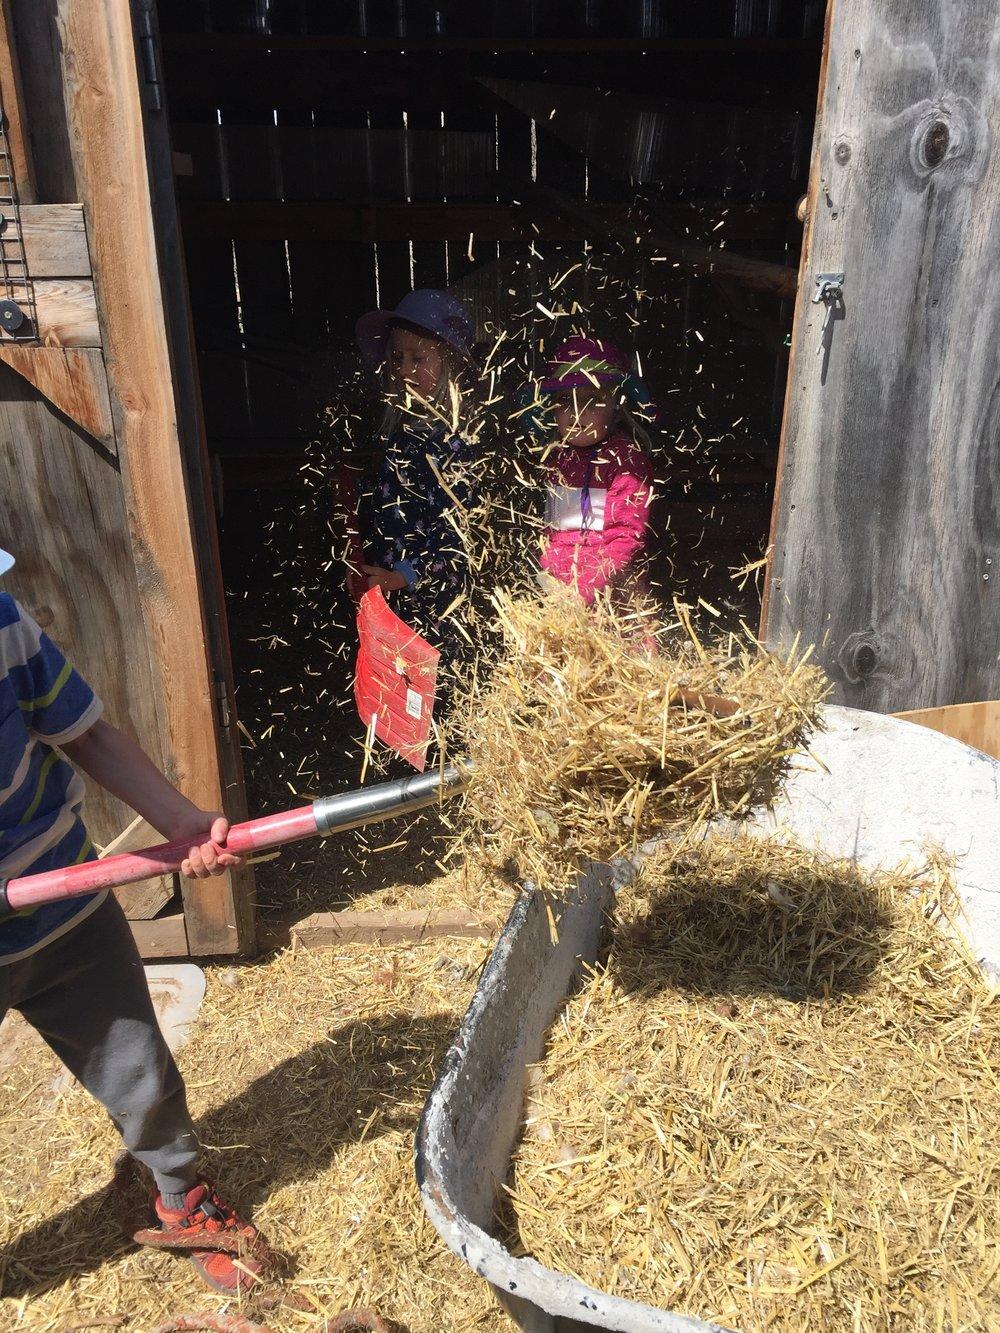 The hay hanging in midair is mesmerizing.